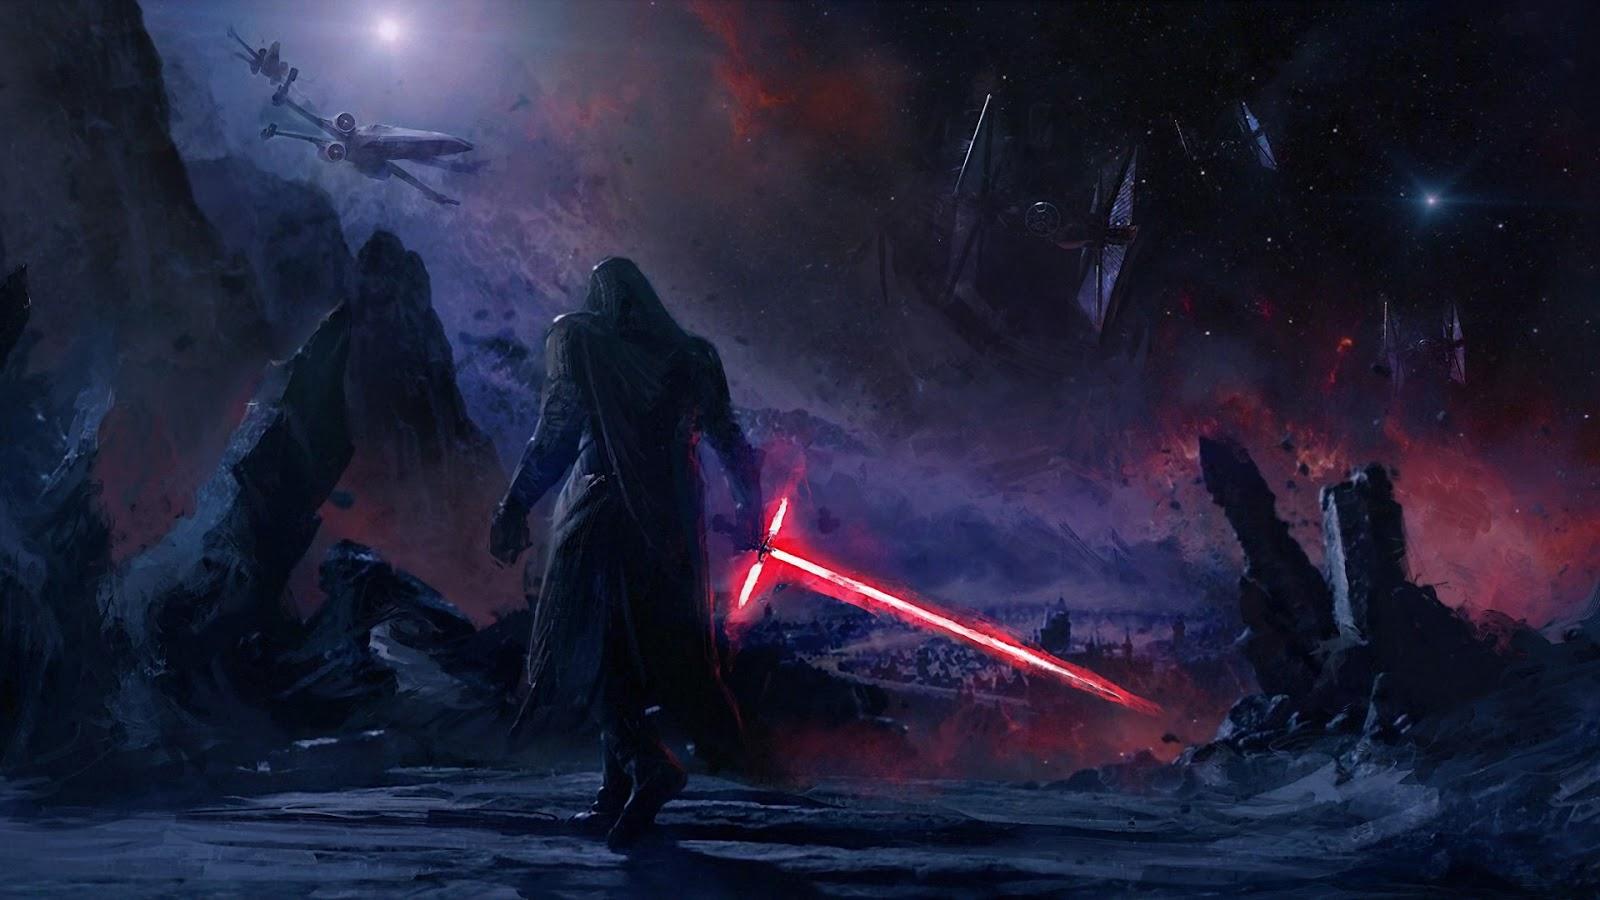 Star Wars The Last Jedi Kylo Ren Wallpaper 1920 X 1080